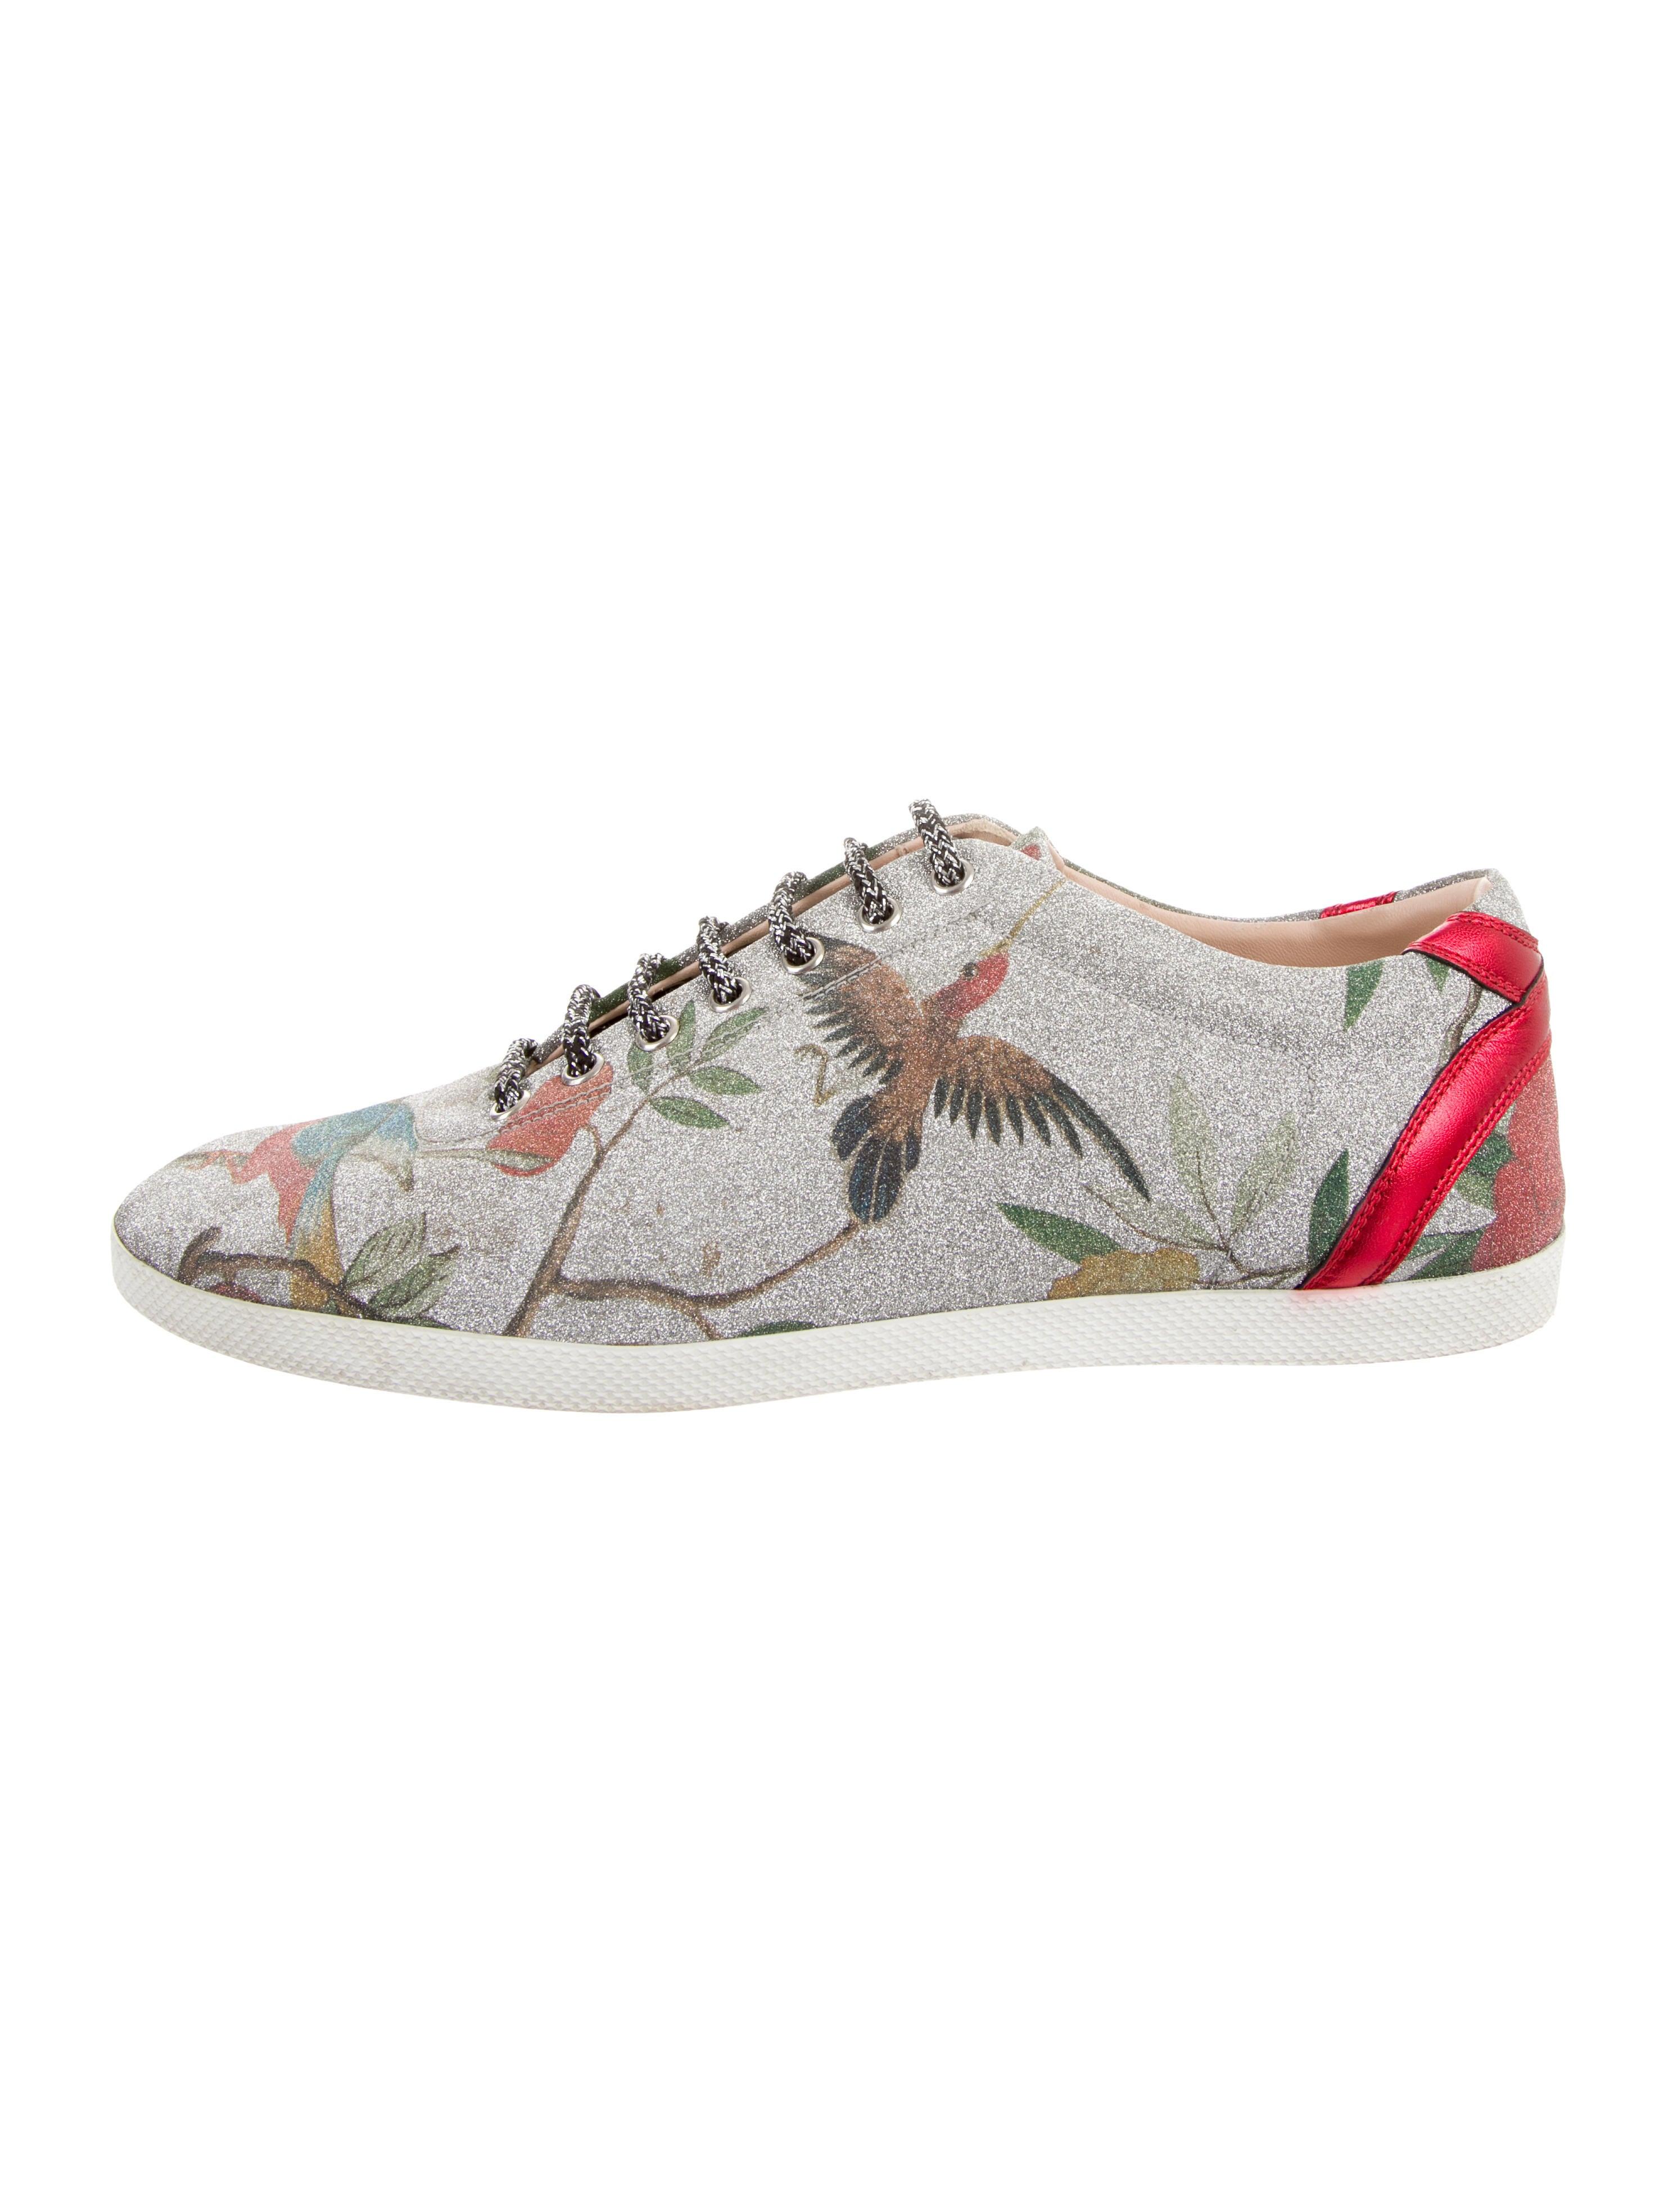 Gucci Bambi Tian Glitter Sneakers